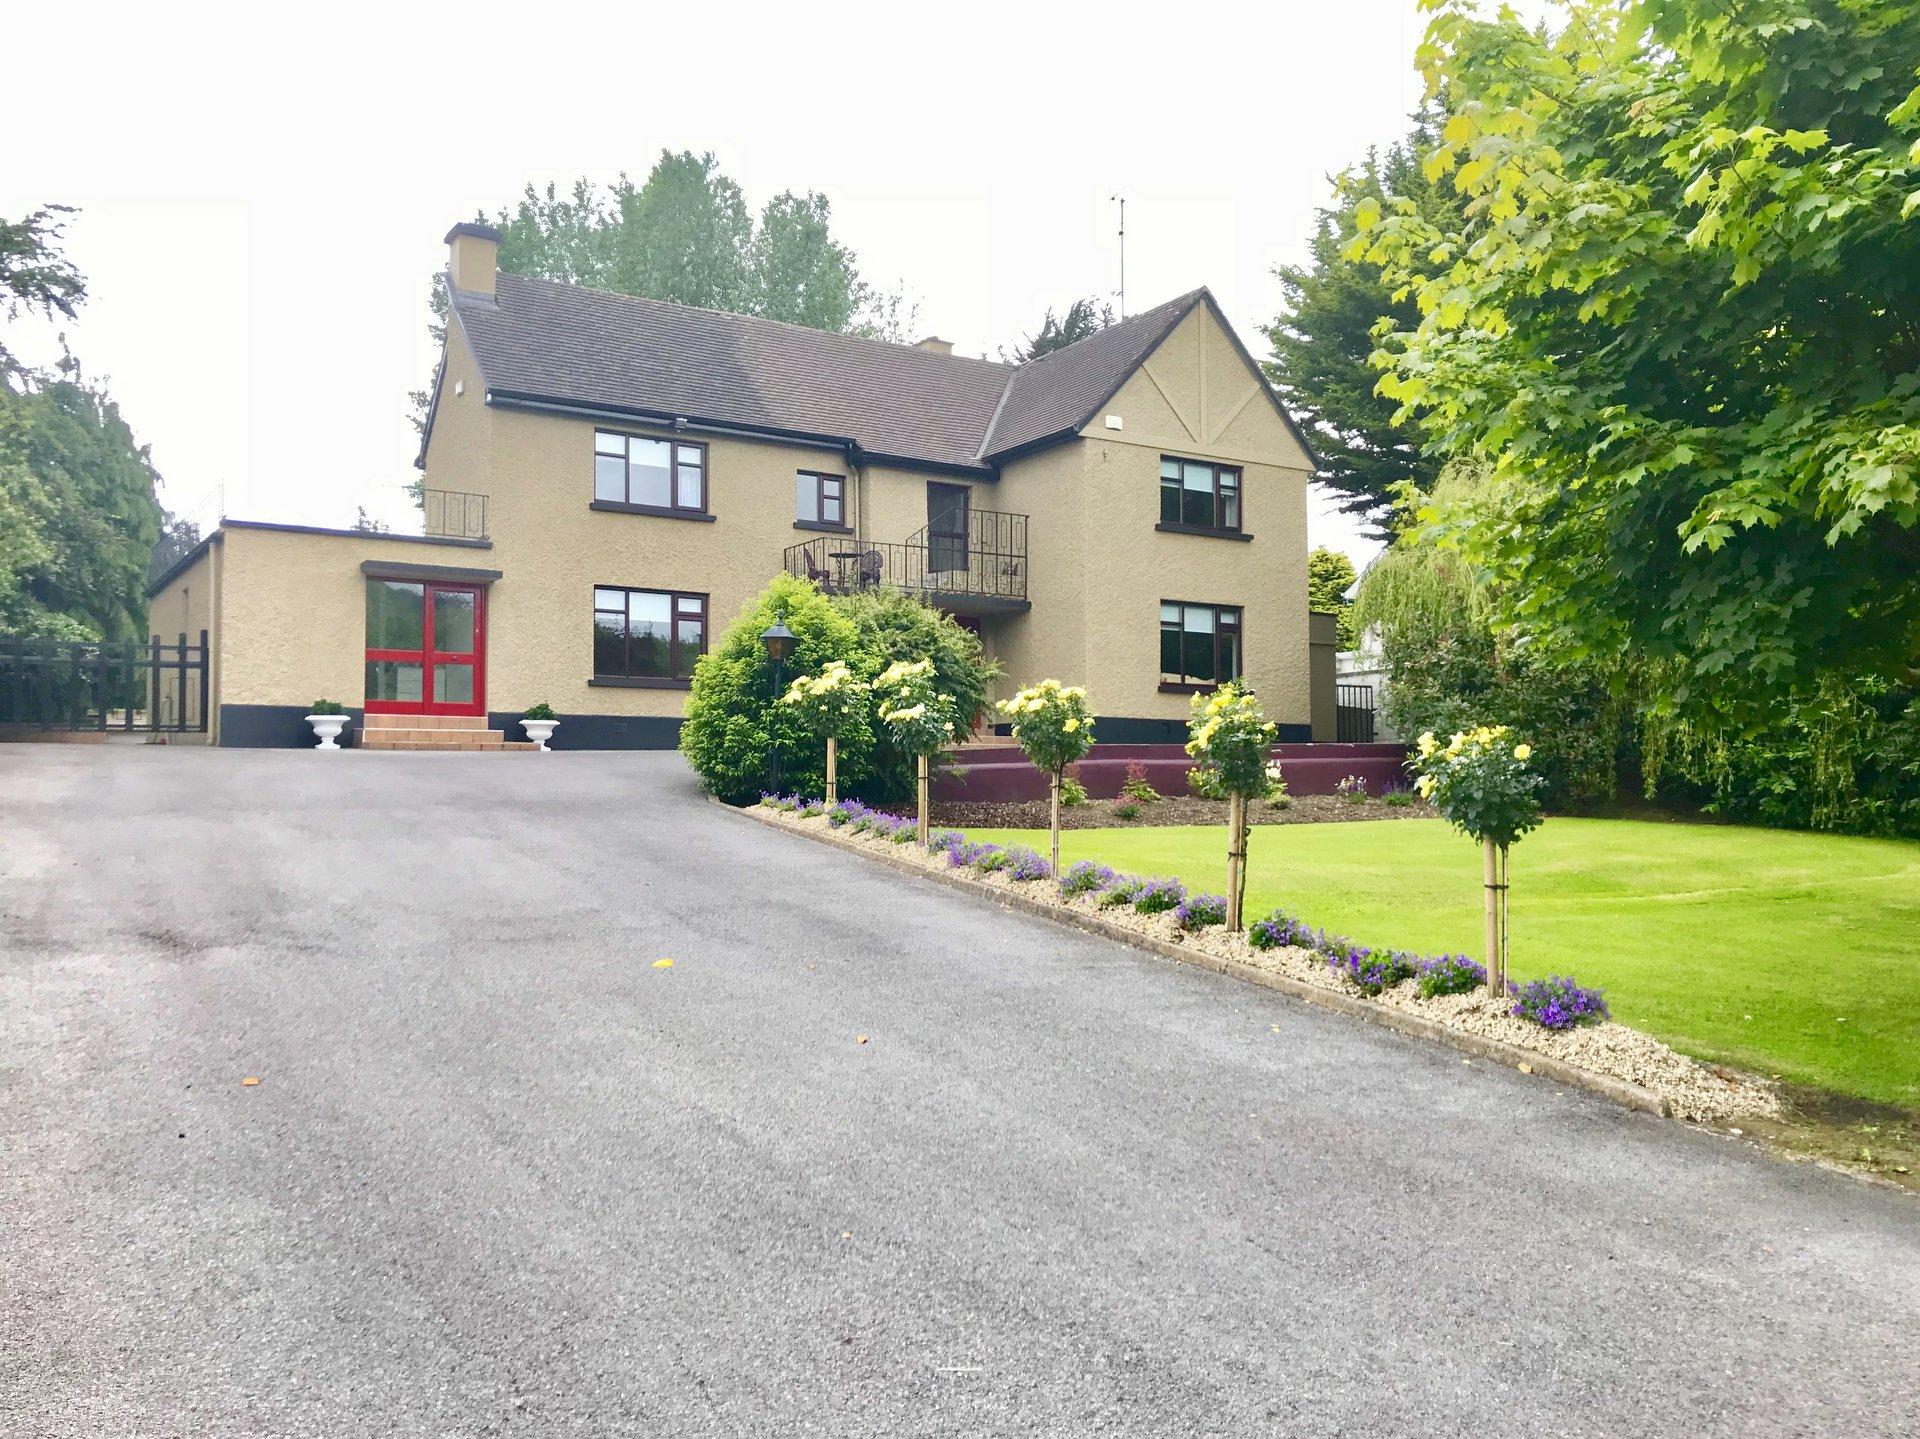 Ashdale, Dublin Road, Longford Town, Co. Longford N39 P1H3